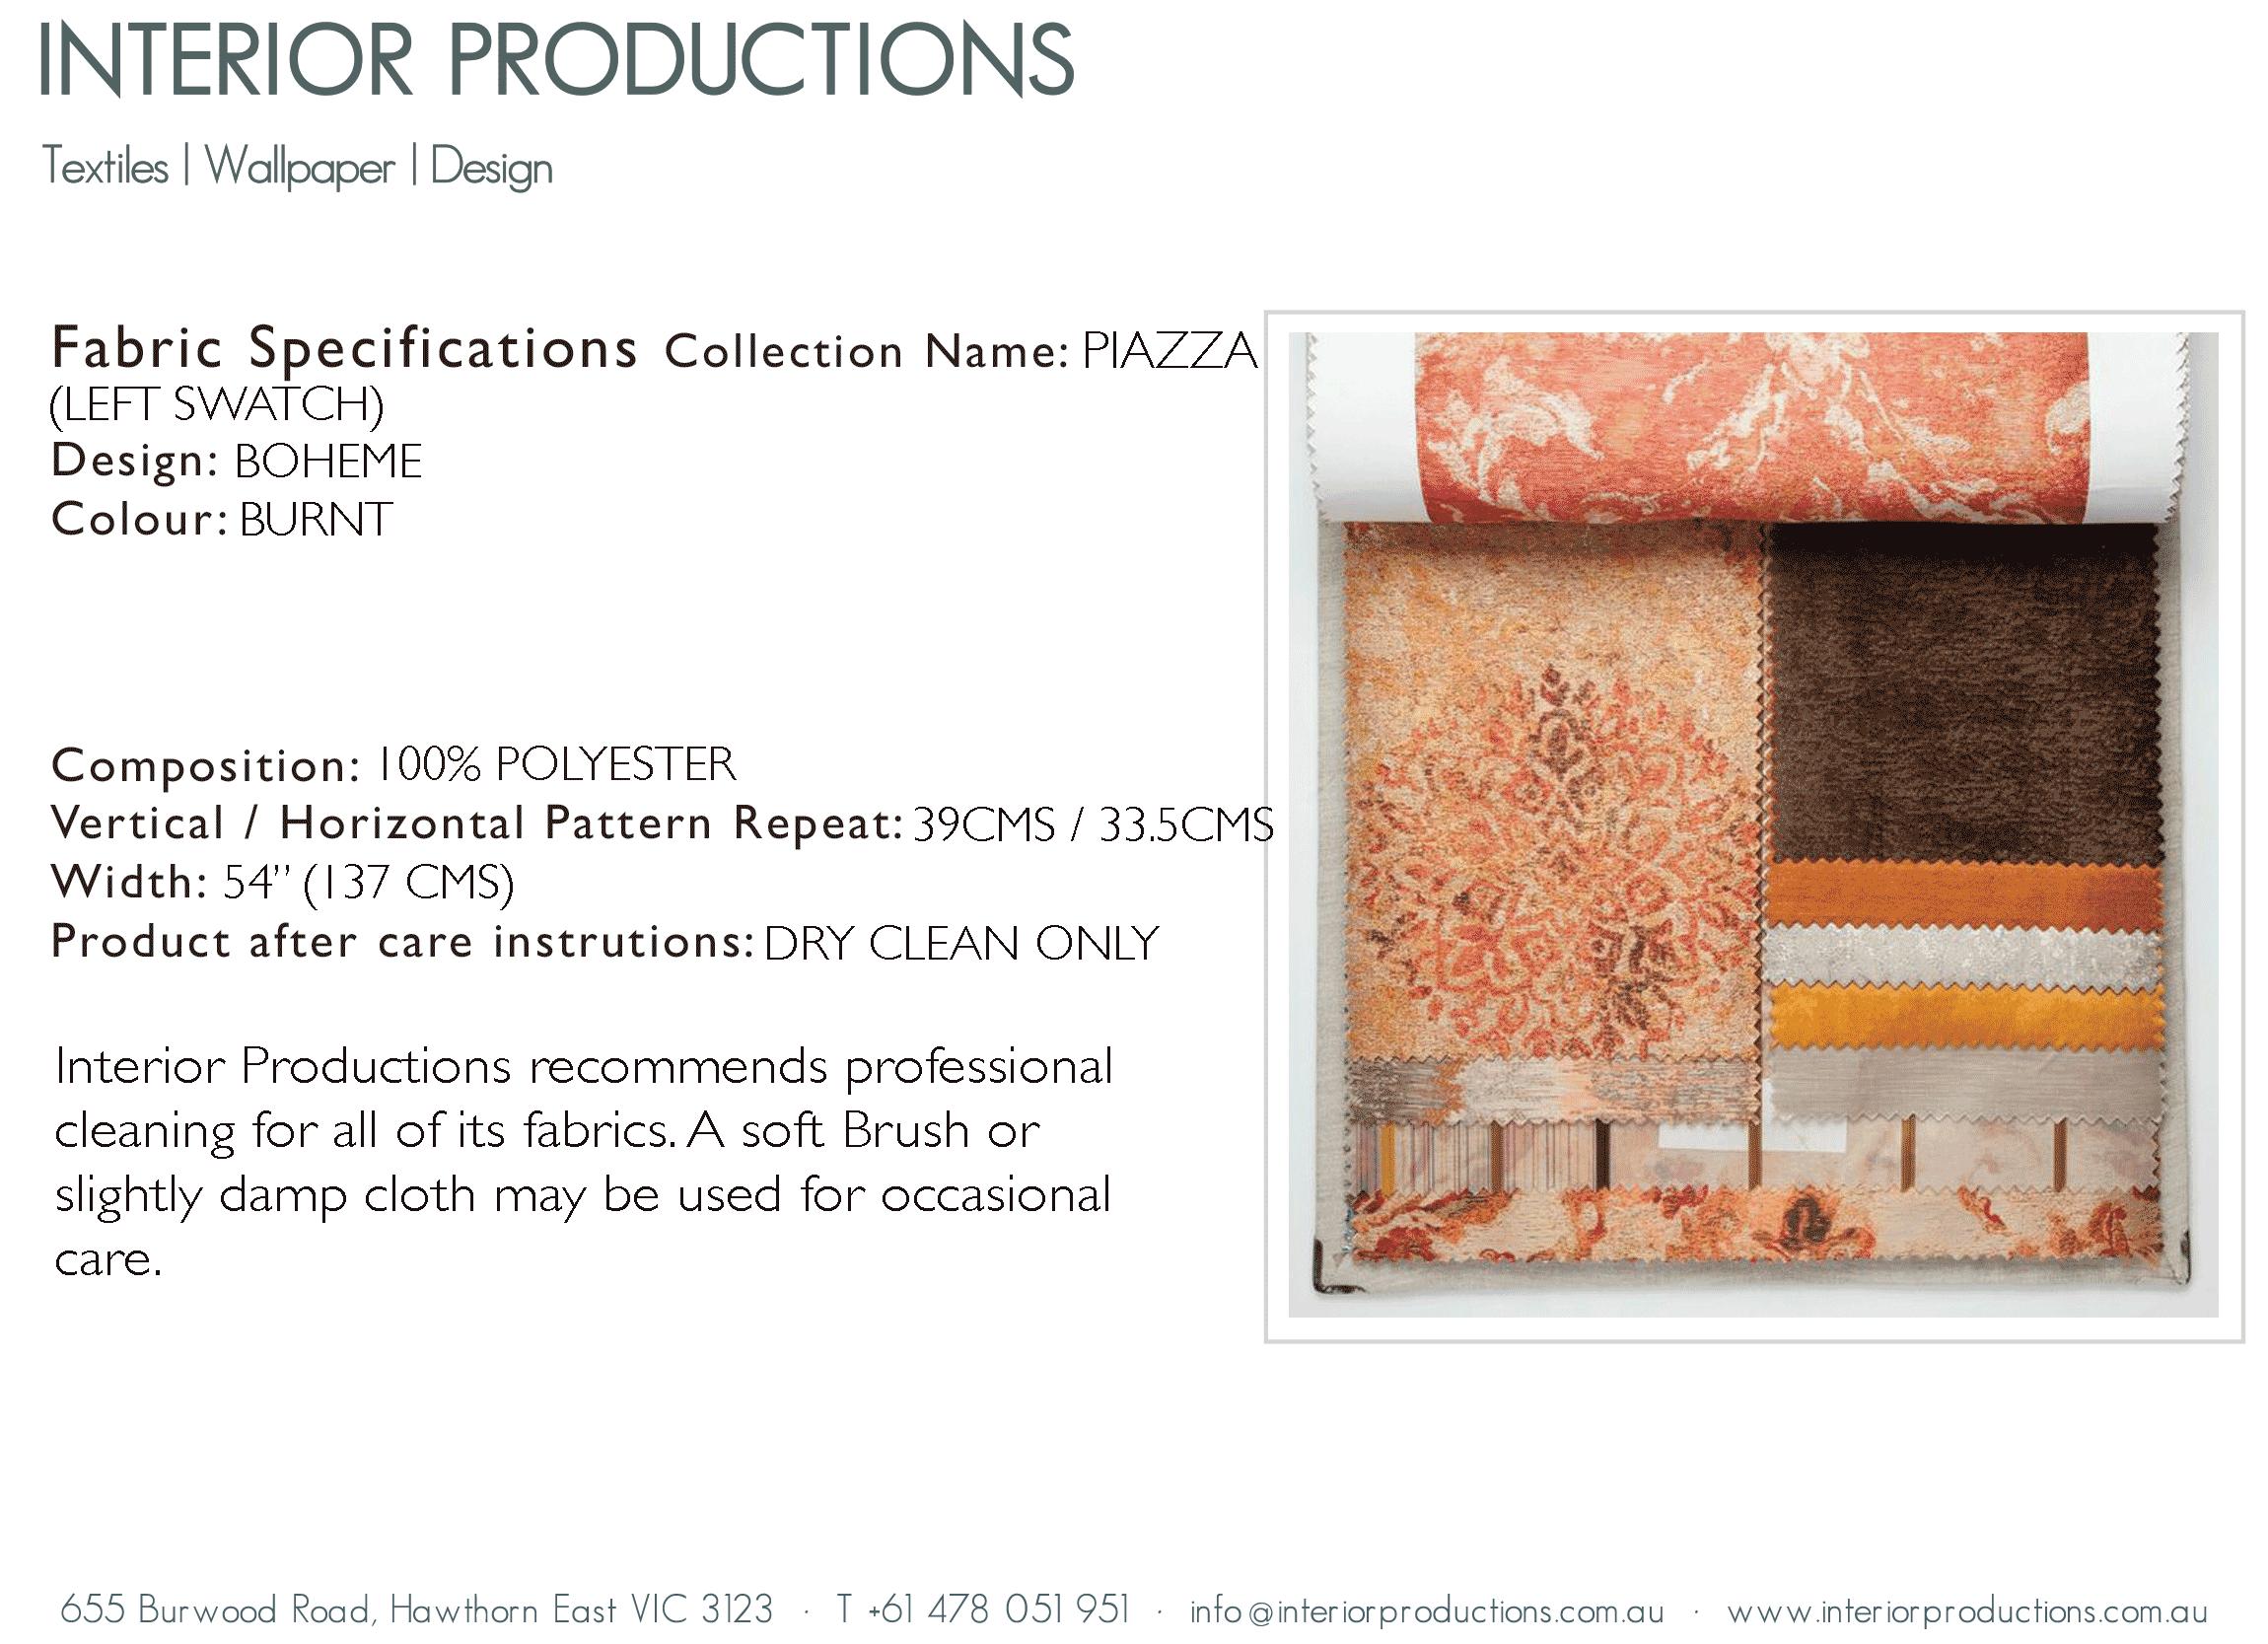 interior_productions_BOHEME---BURNT